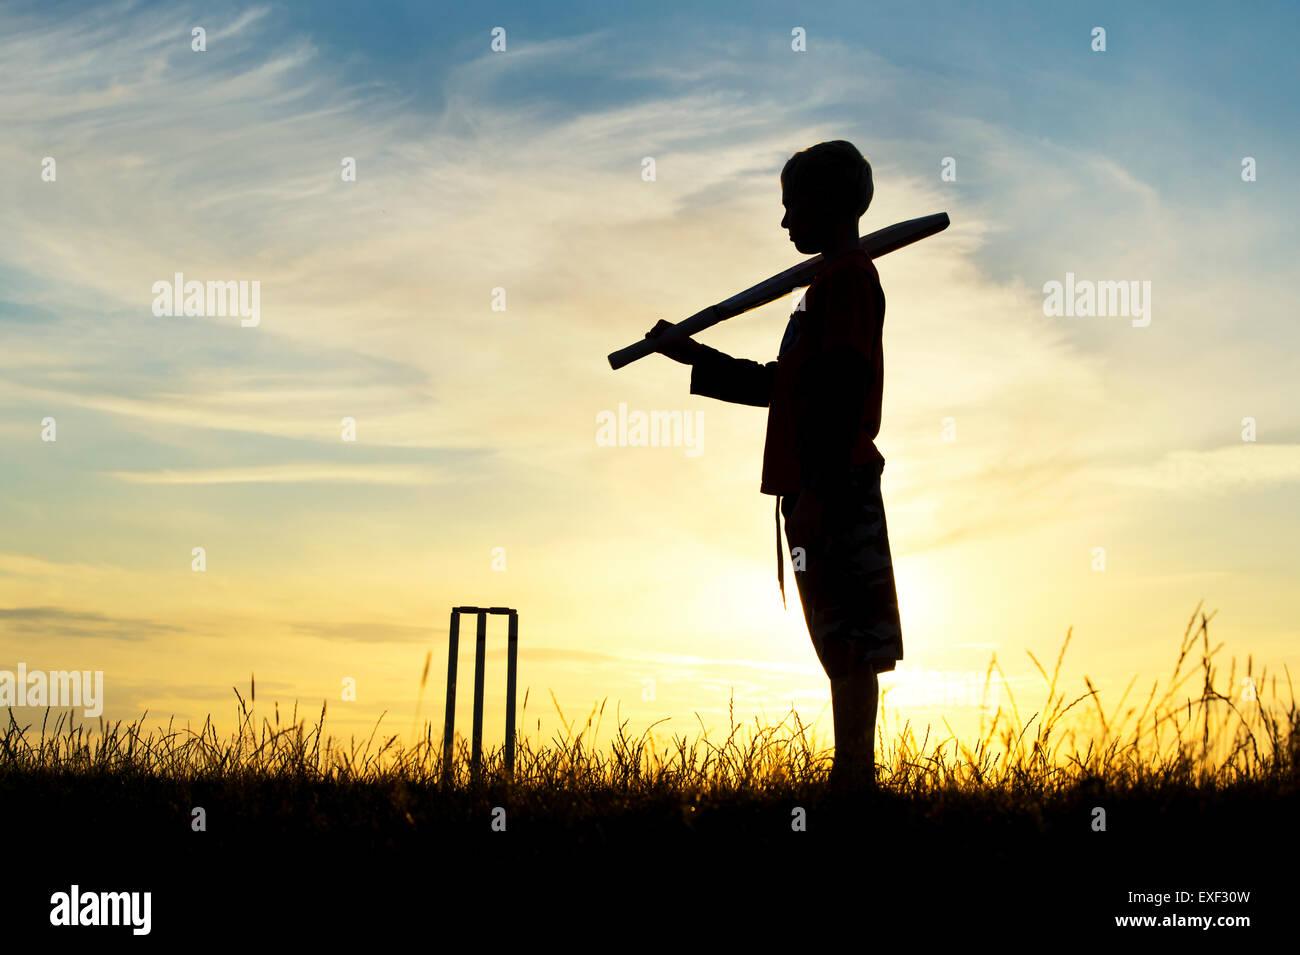 Silueta de joven jugando críquet contra un fondo de atardecer Imagen De Stock